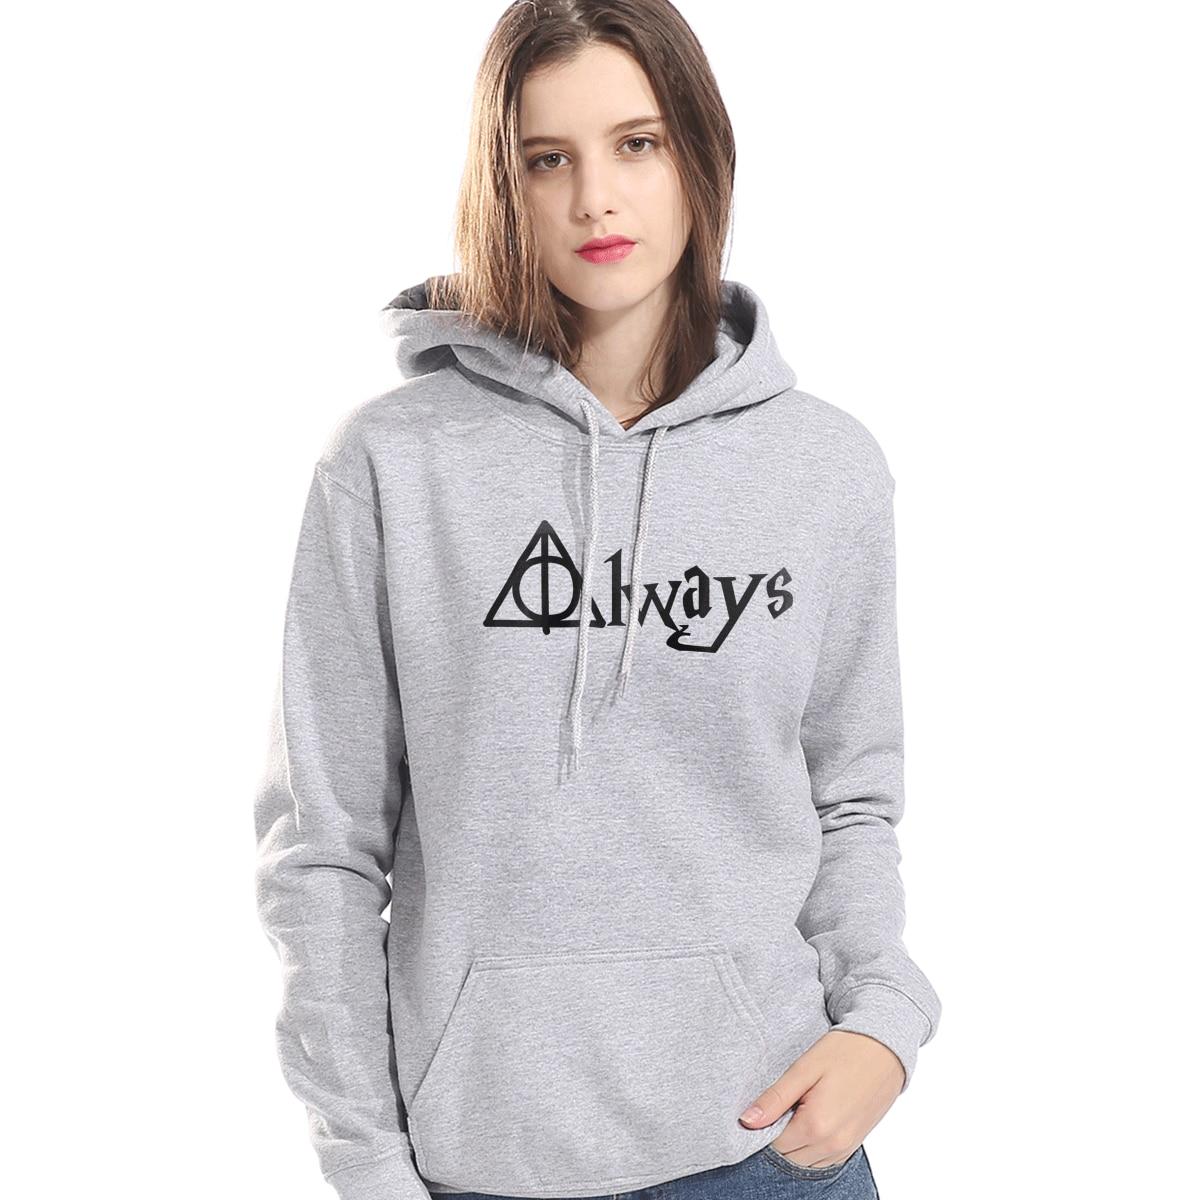 Fashion Womens Clothes 2019 Winter Fleece Hoodie For Women Hip Hop Sweatshirt Always Hallows Print Harajuku Tracksuit Streetwear